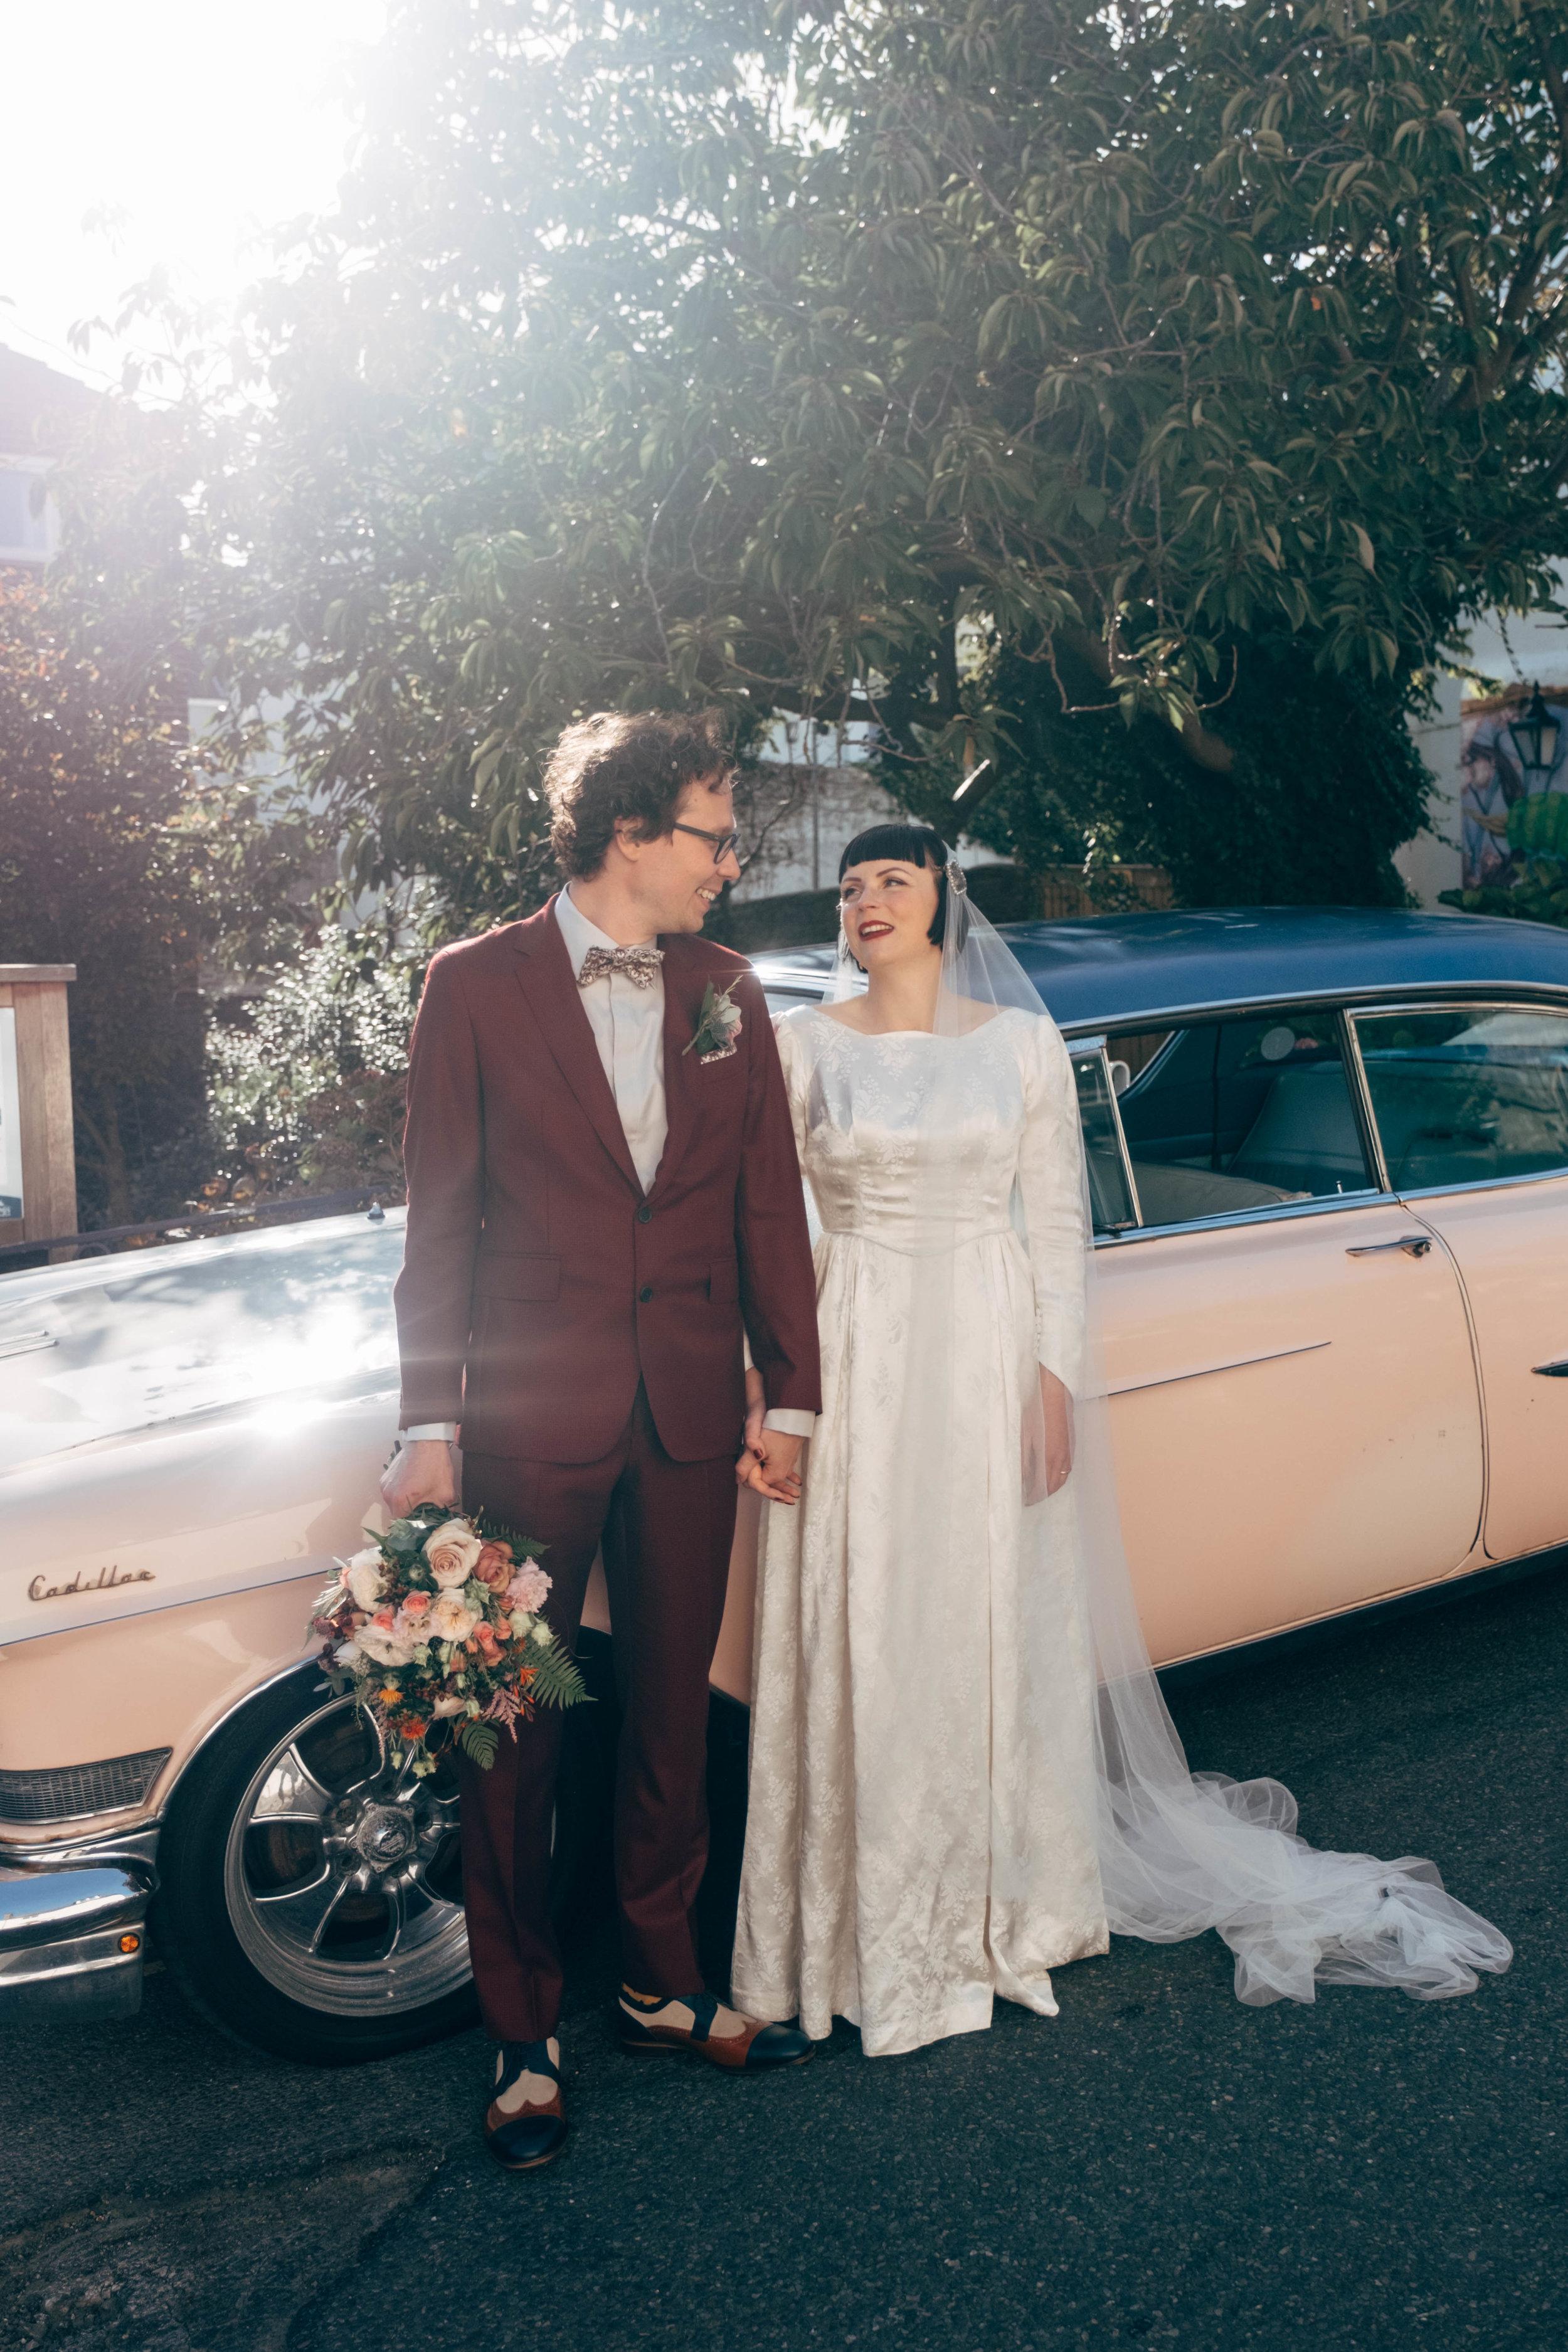 Jacob Sophia Wedding Photos167.jpg